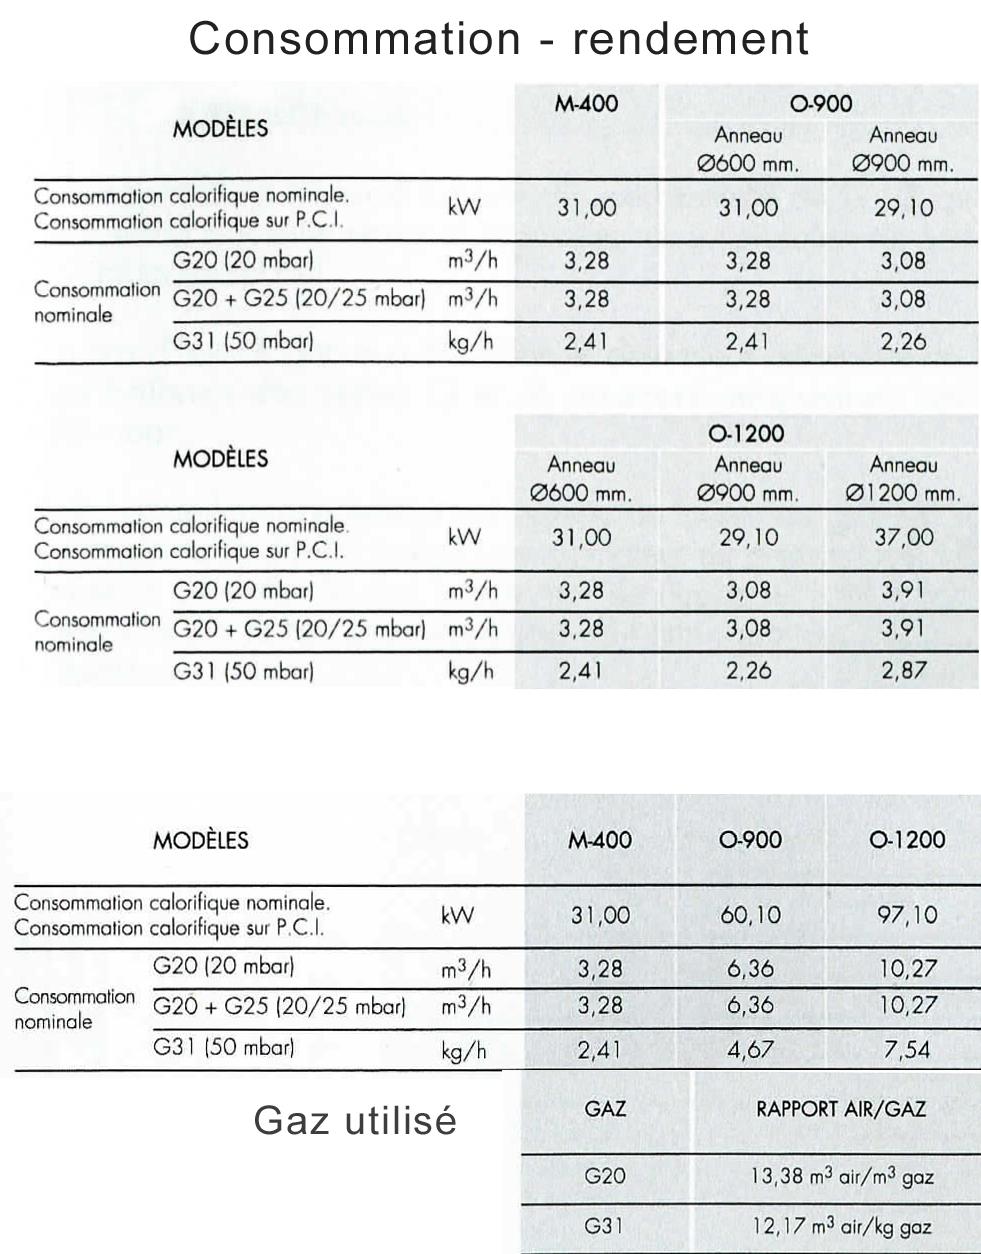 Bruleur industriel d1200 max flames vlc - Consommation gaz moyenne ...